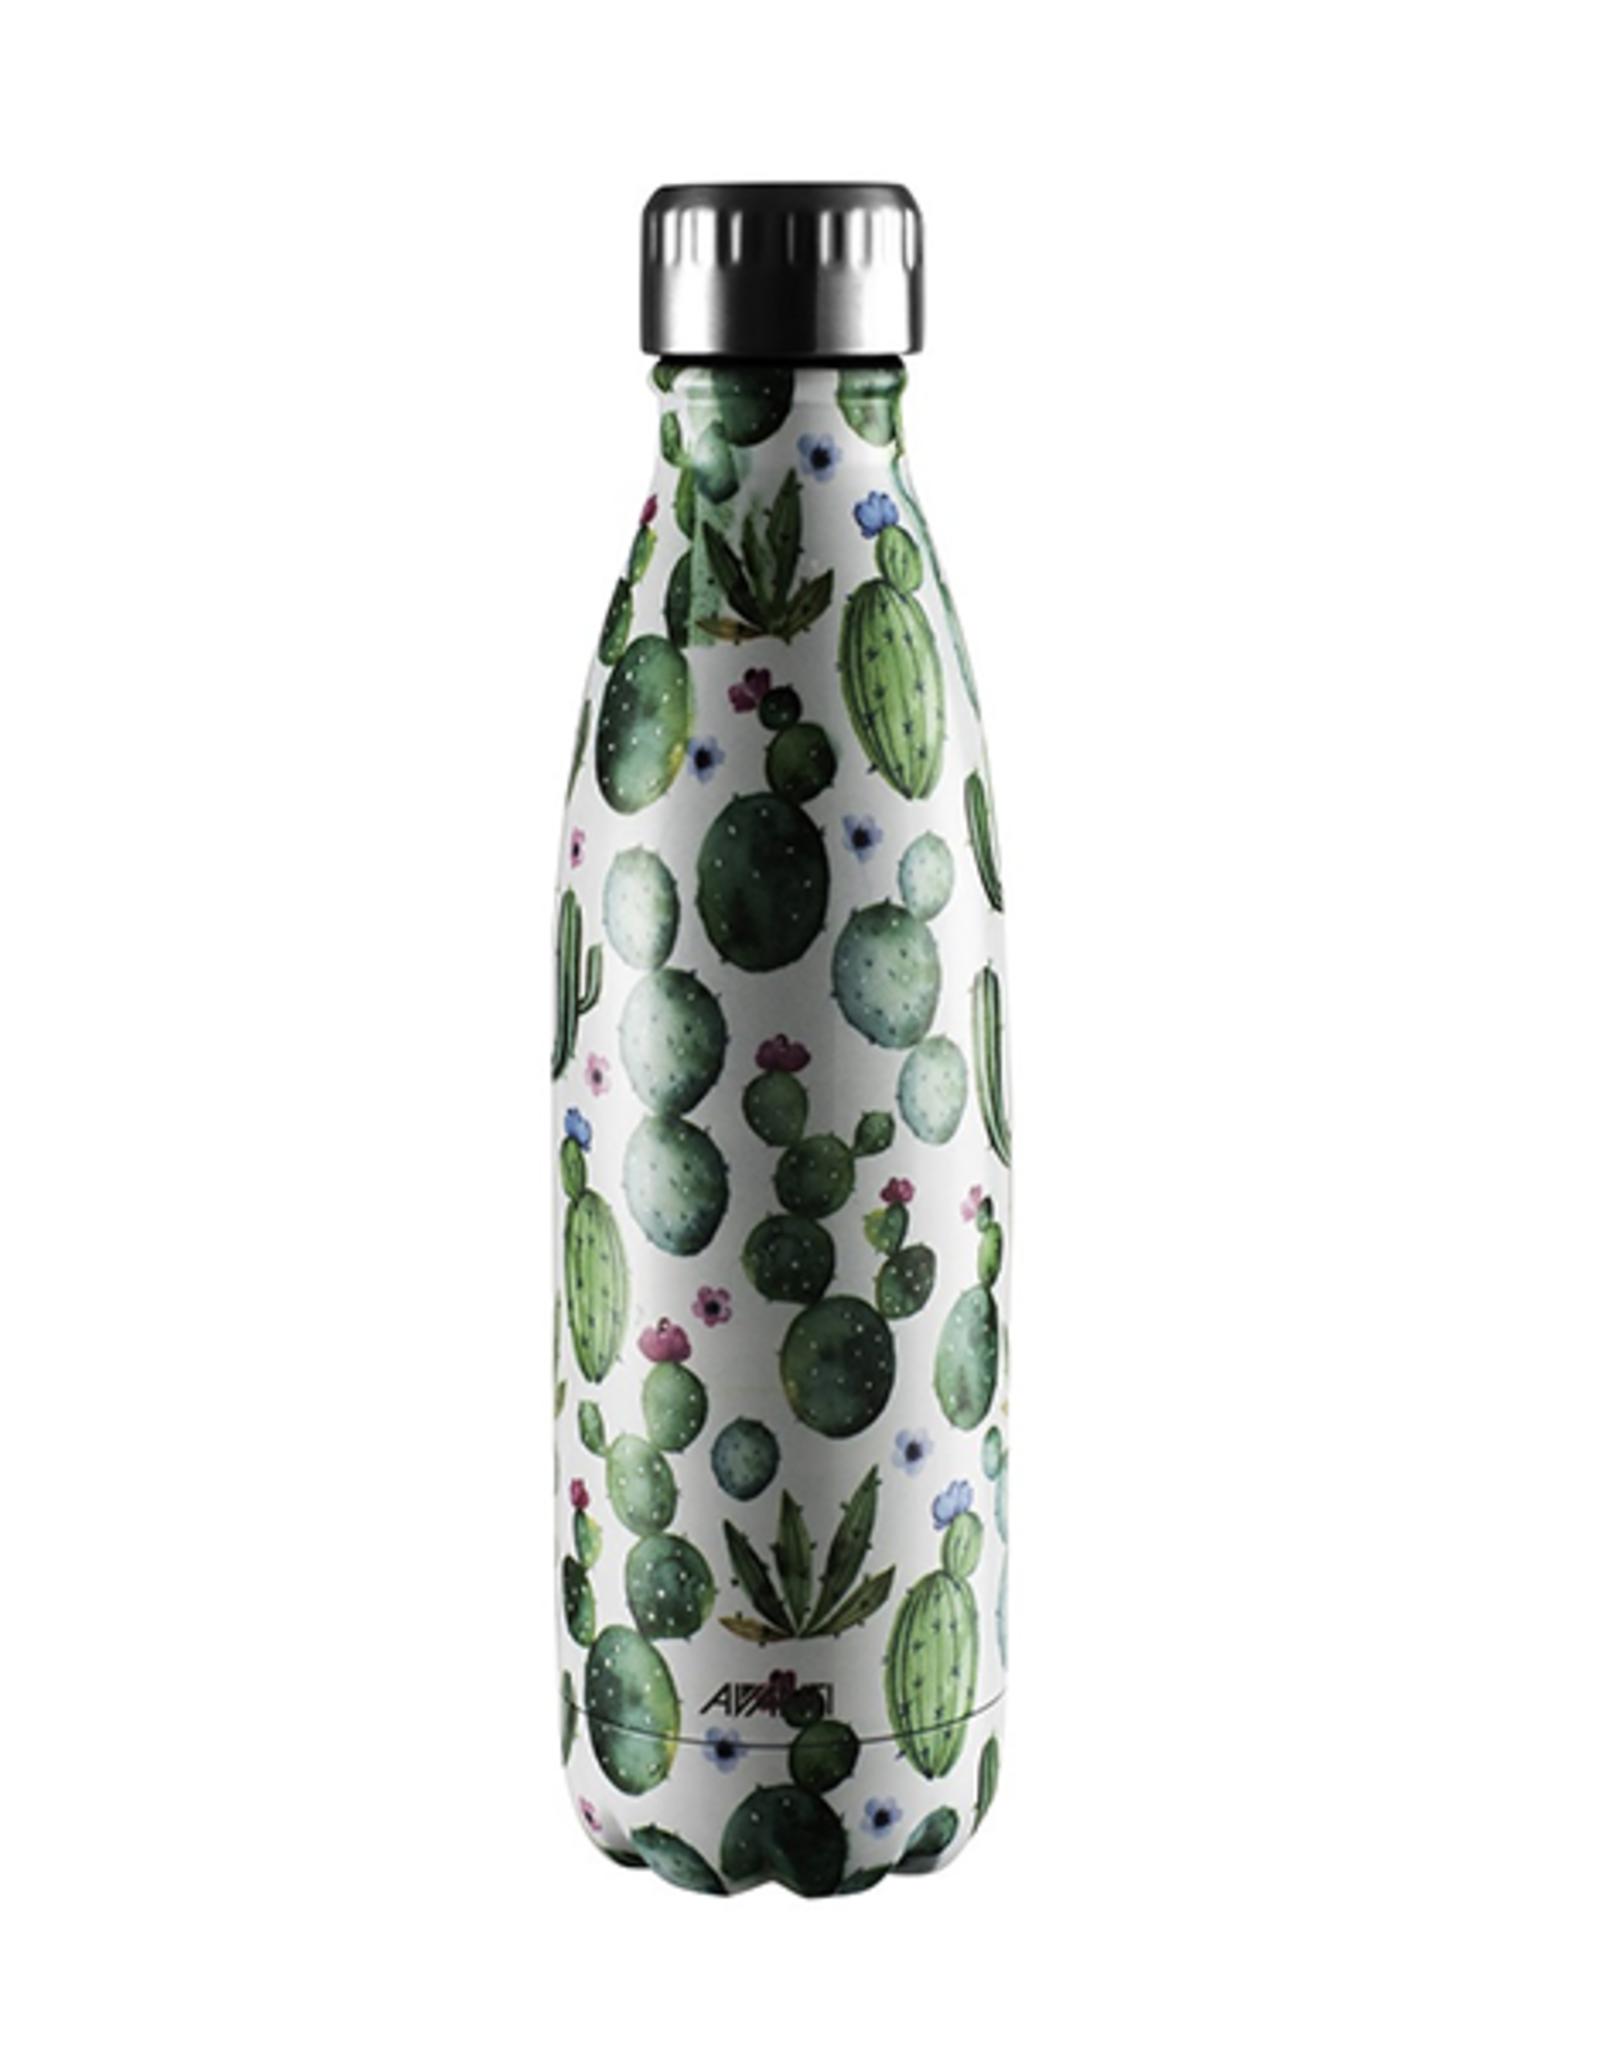 Avanti Homewares Fluid Bottle 500ml - Cactus